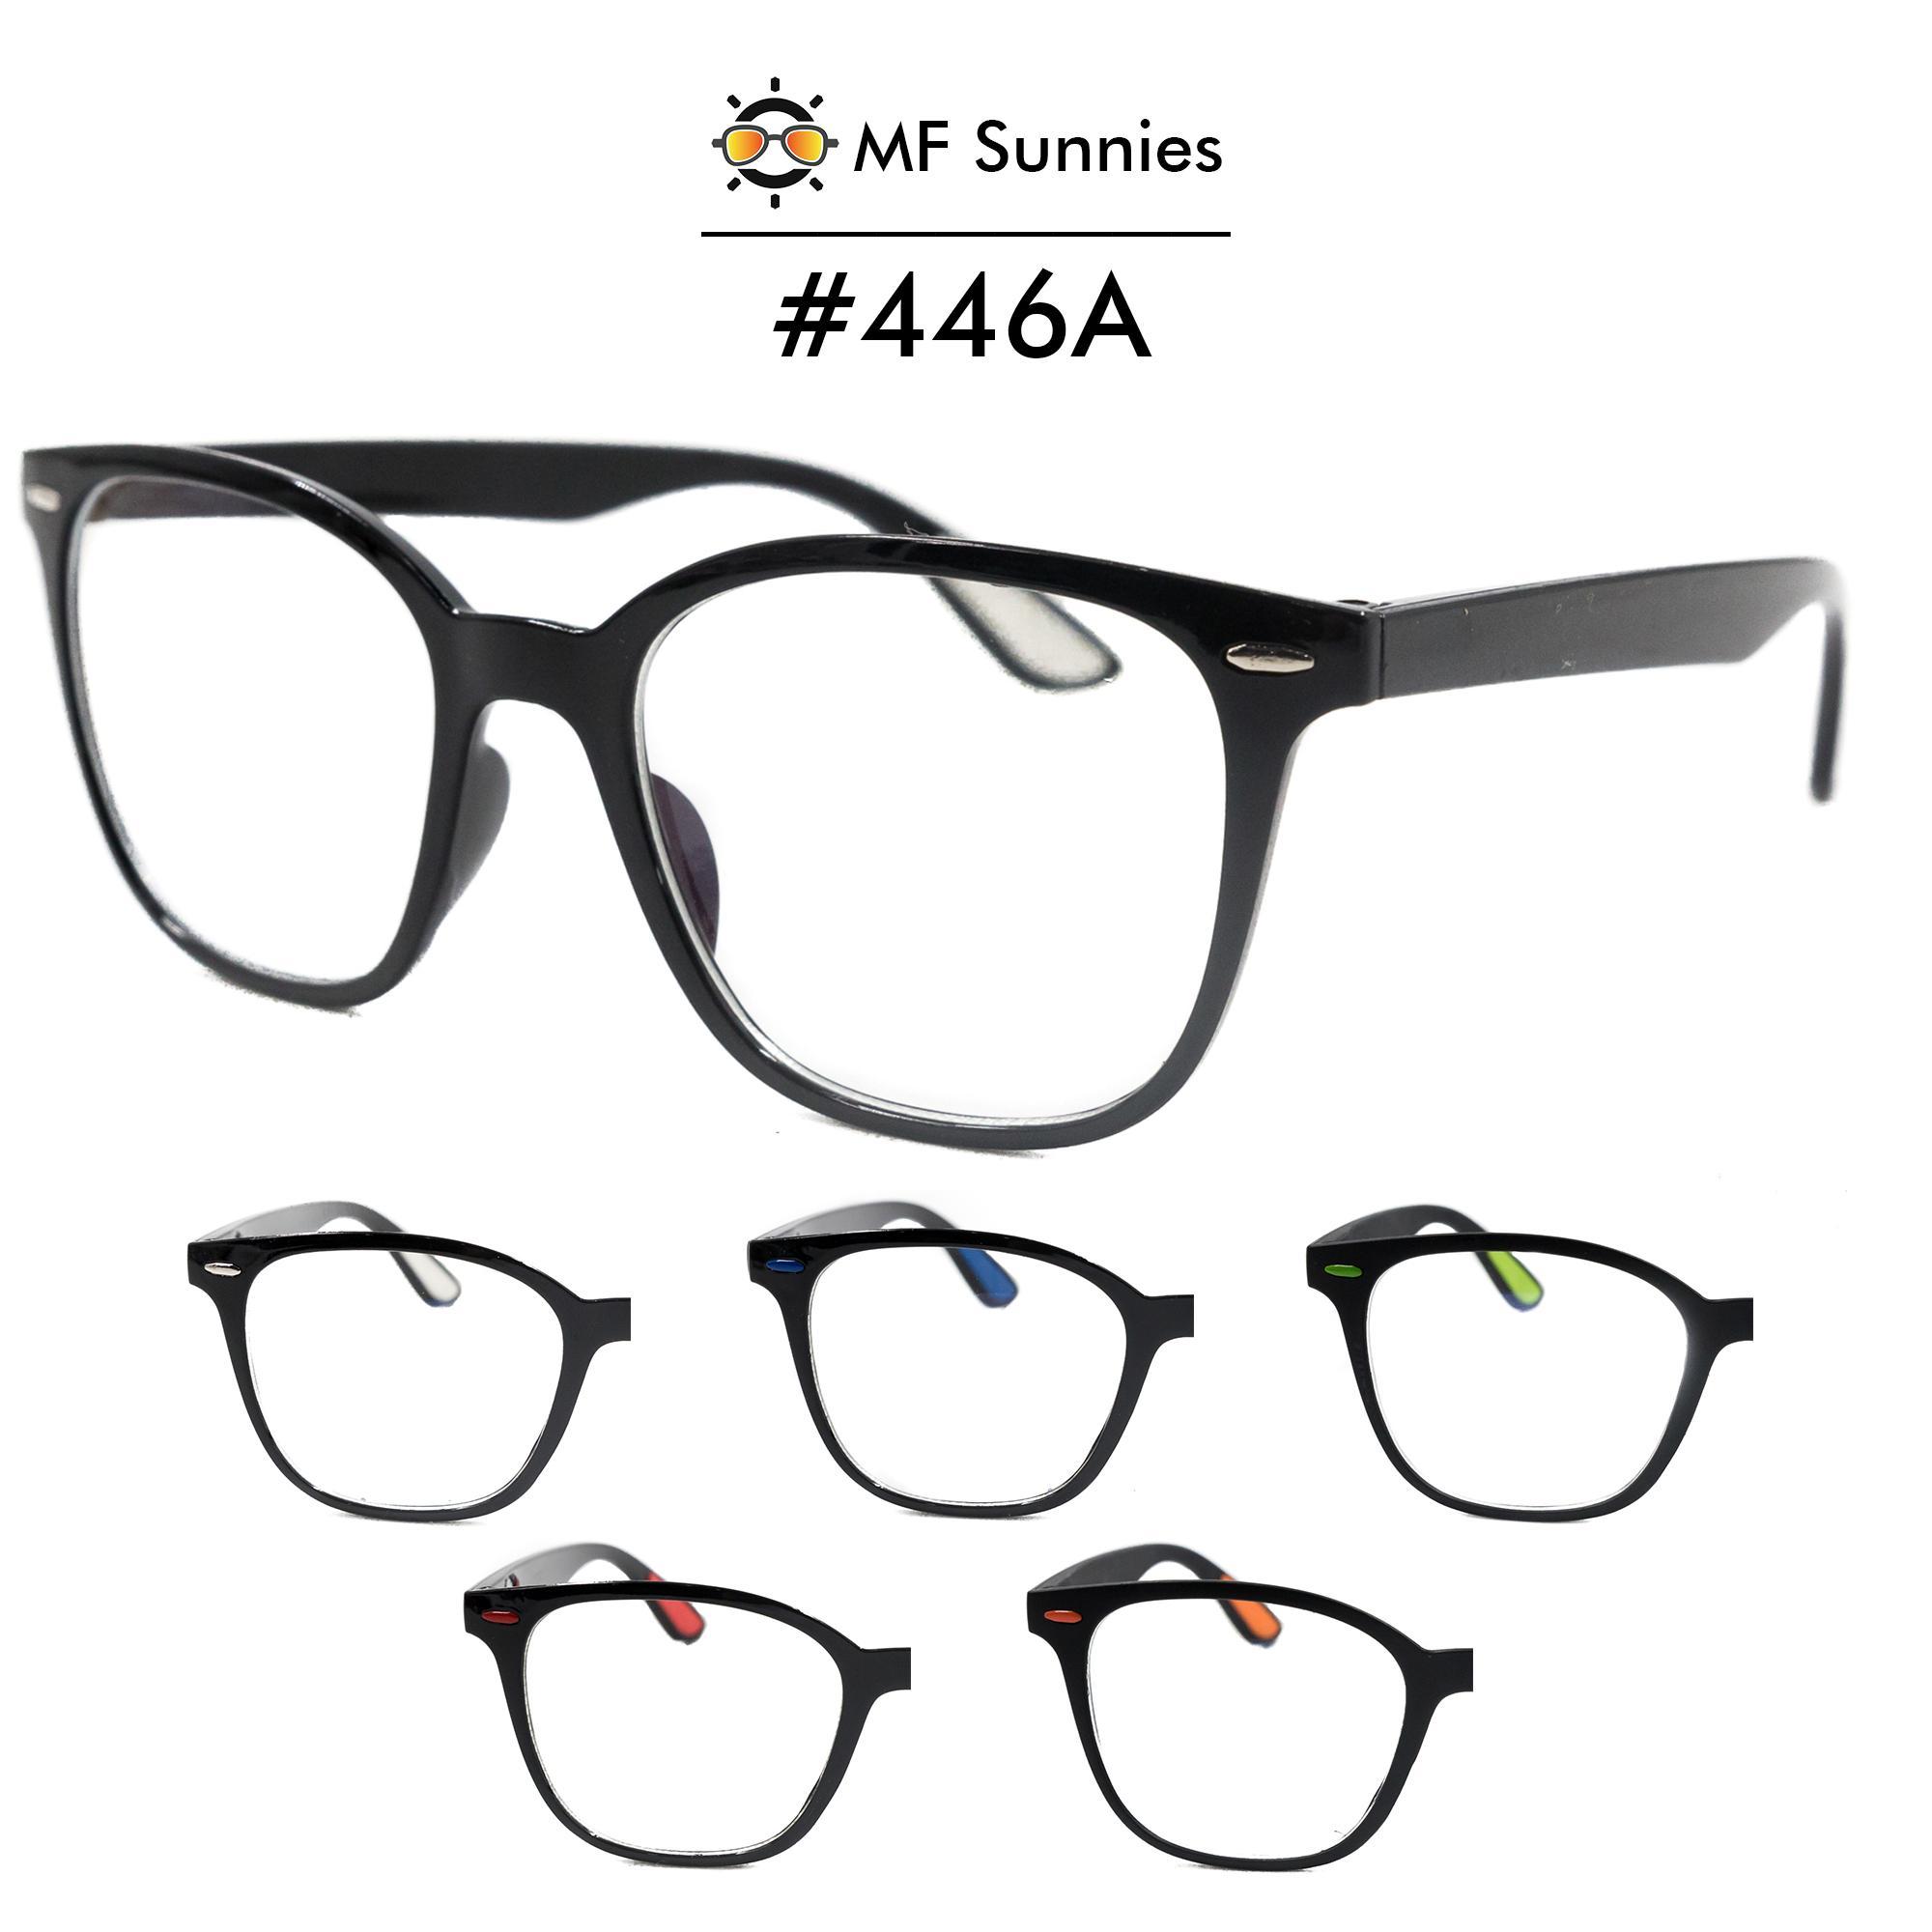 c5f21eee4307 MFSunnies Computer Anti-Radiation / Anti-Blue Light Flexible Frame Fashion  Eyewear #446C